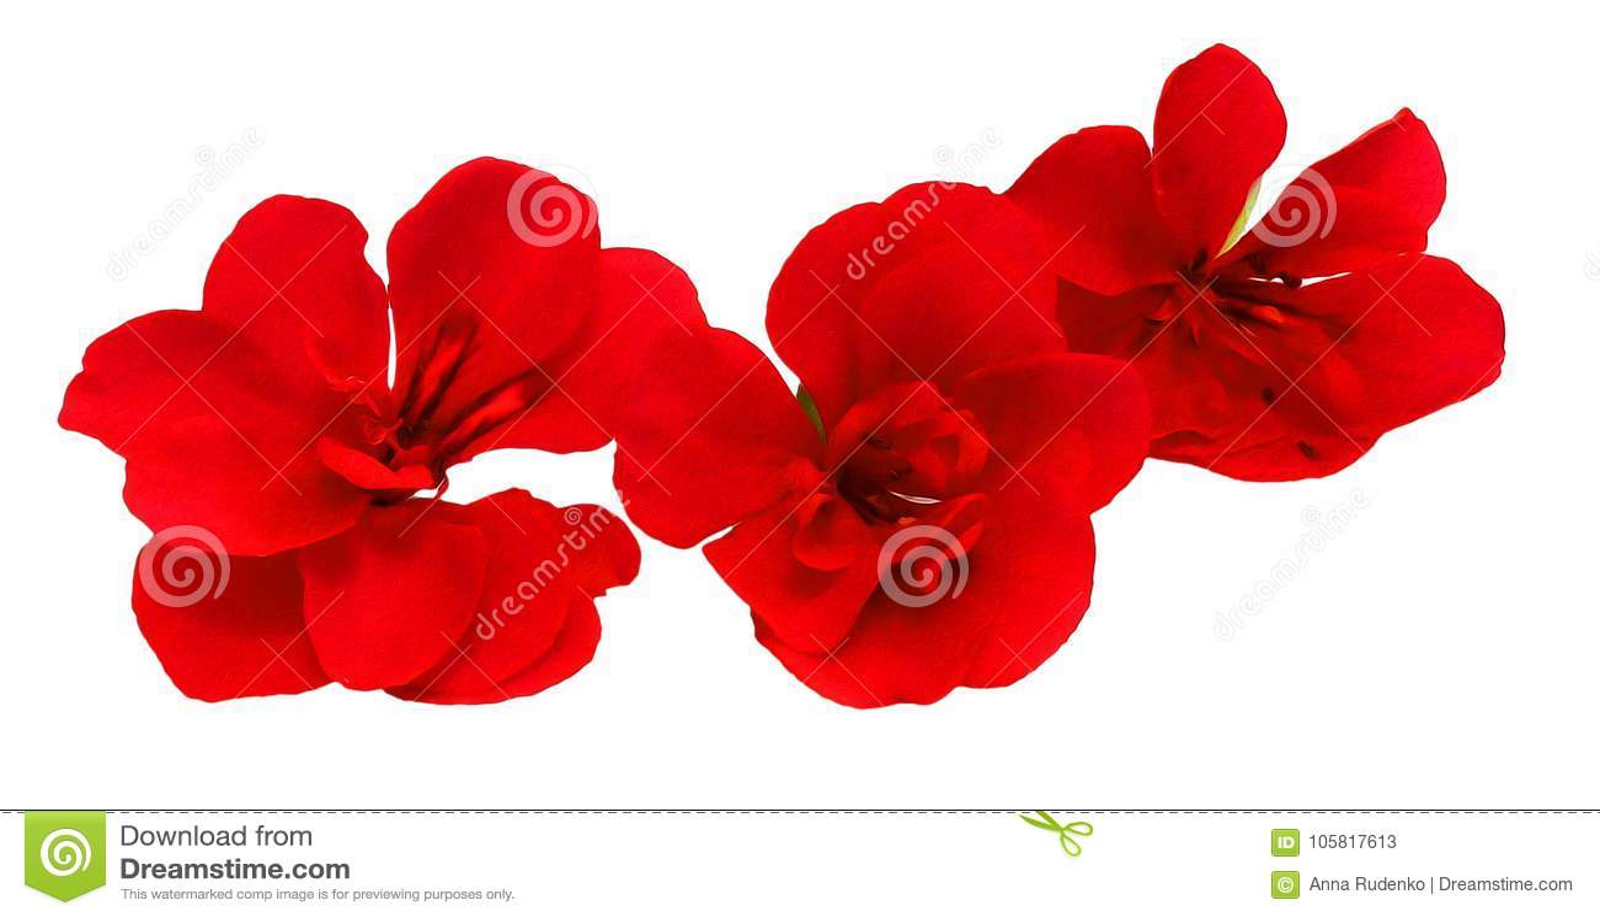 Geranium flowers in the shape of roses fresh, photo manipulation